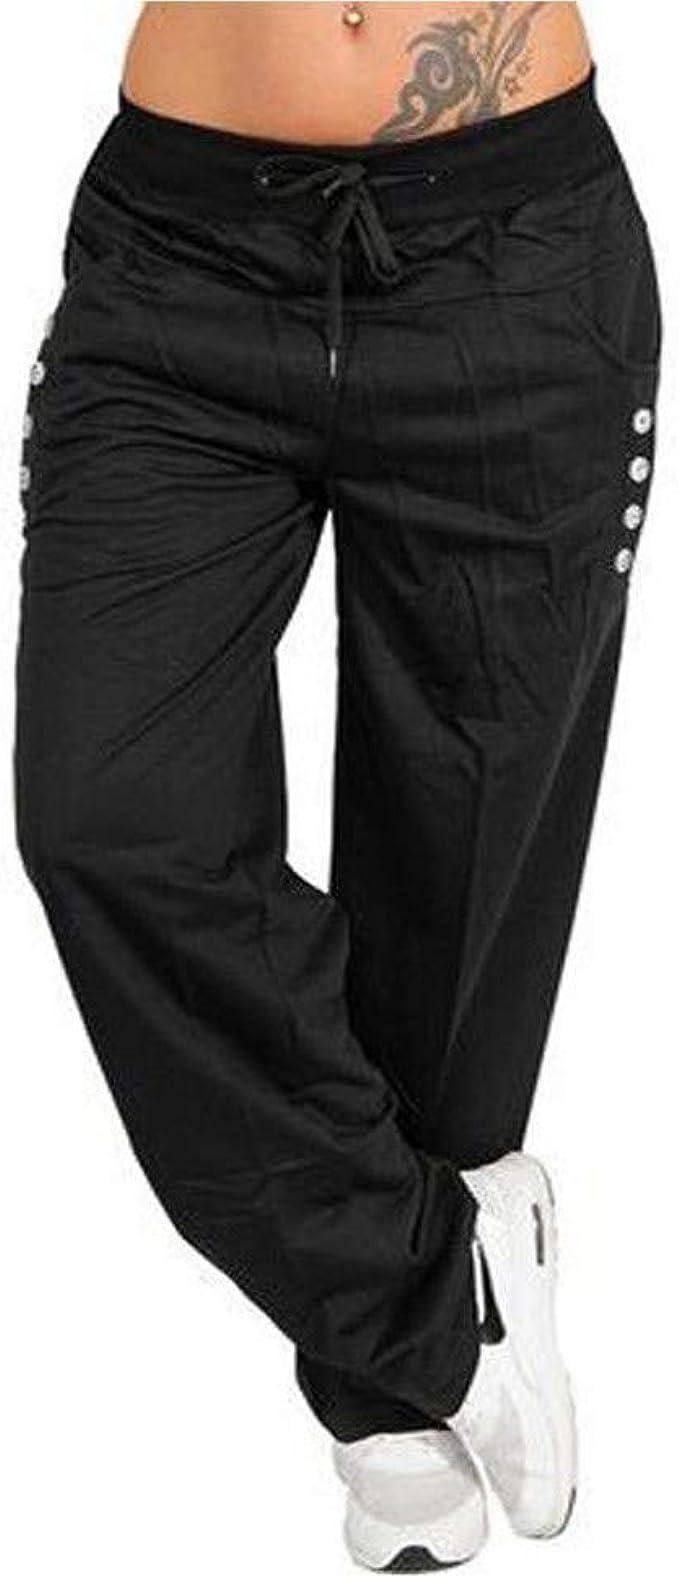 UK Women Laides High Waisted Short Jeans Summer Denim Shorts PantsTrouser OYD